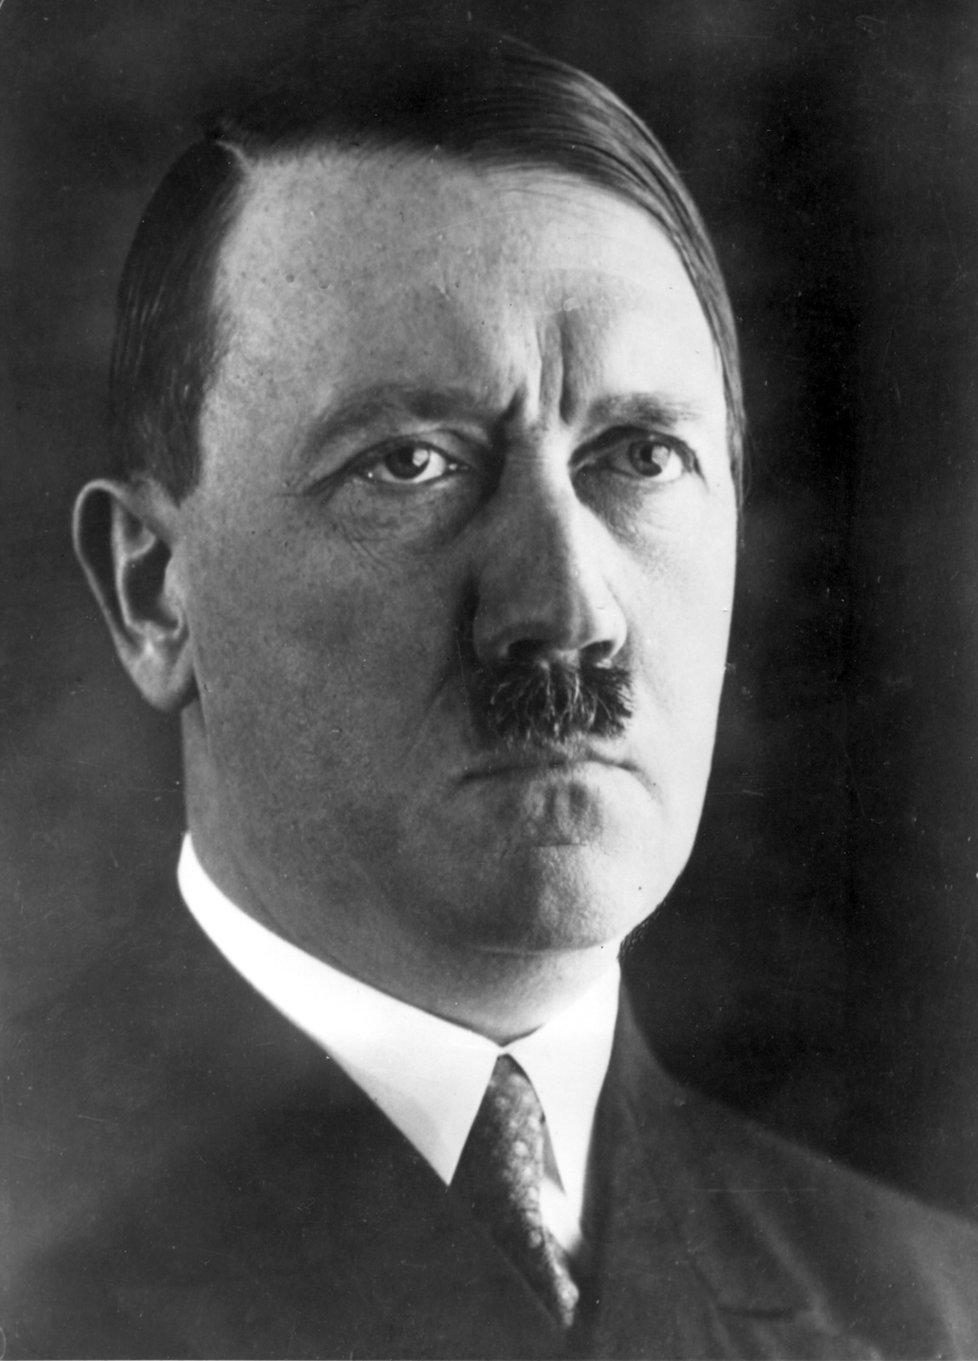 Nacistický diktátor Adolf Hitler